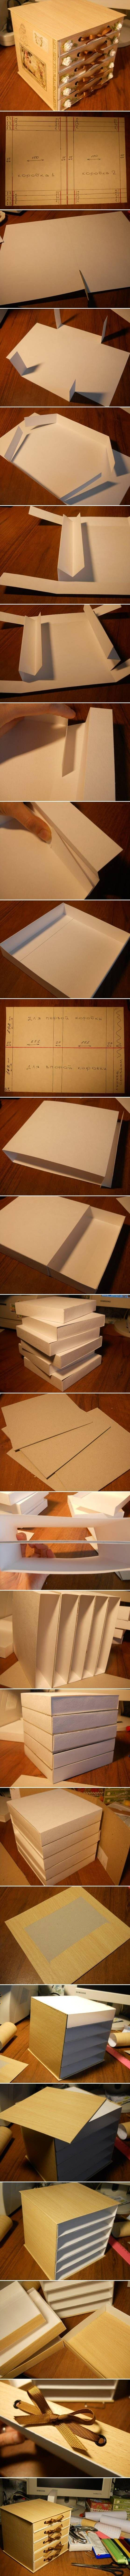 Cute Cardboard Chest